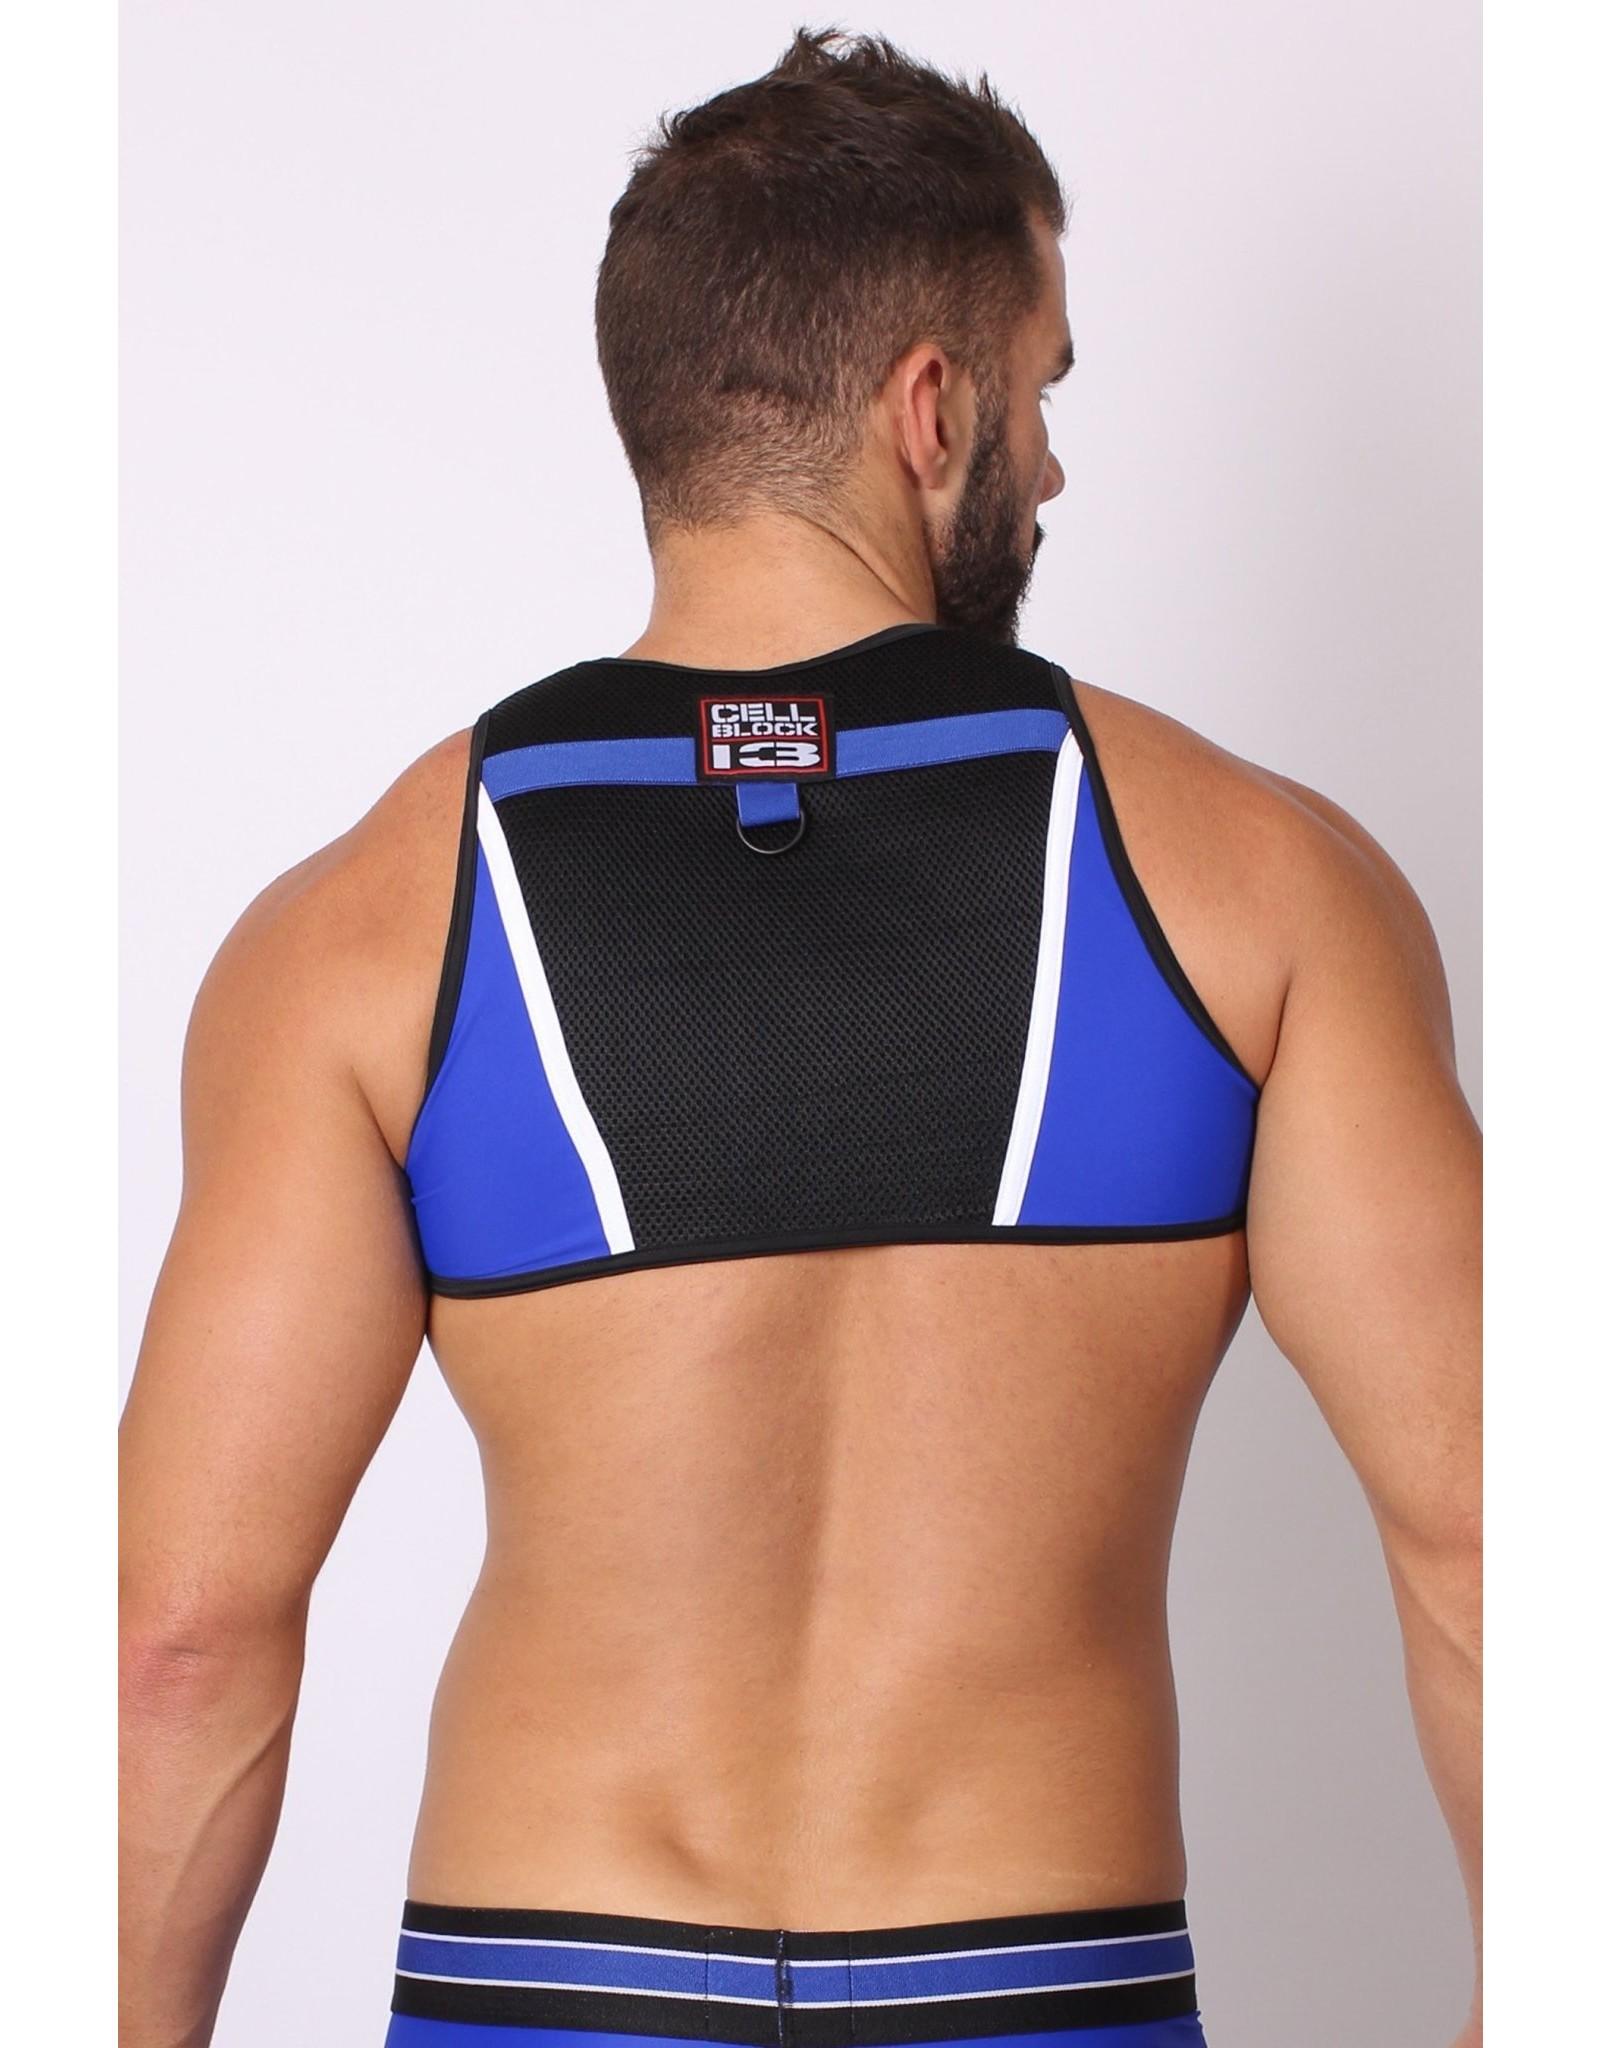 Cellblock13 Cellblock13 Ranger Harness